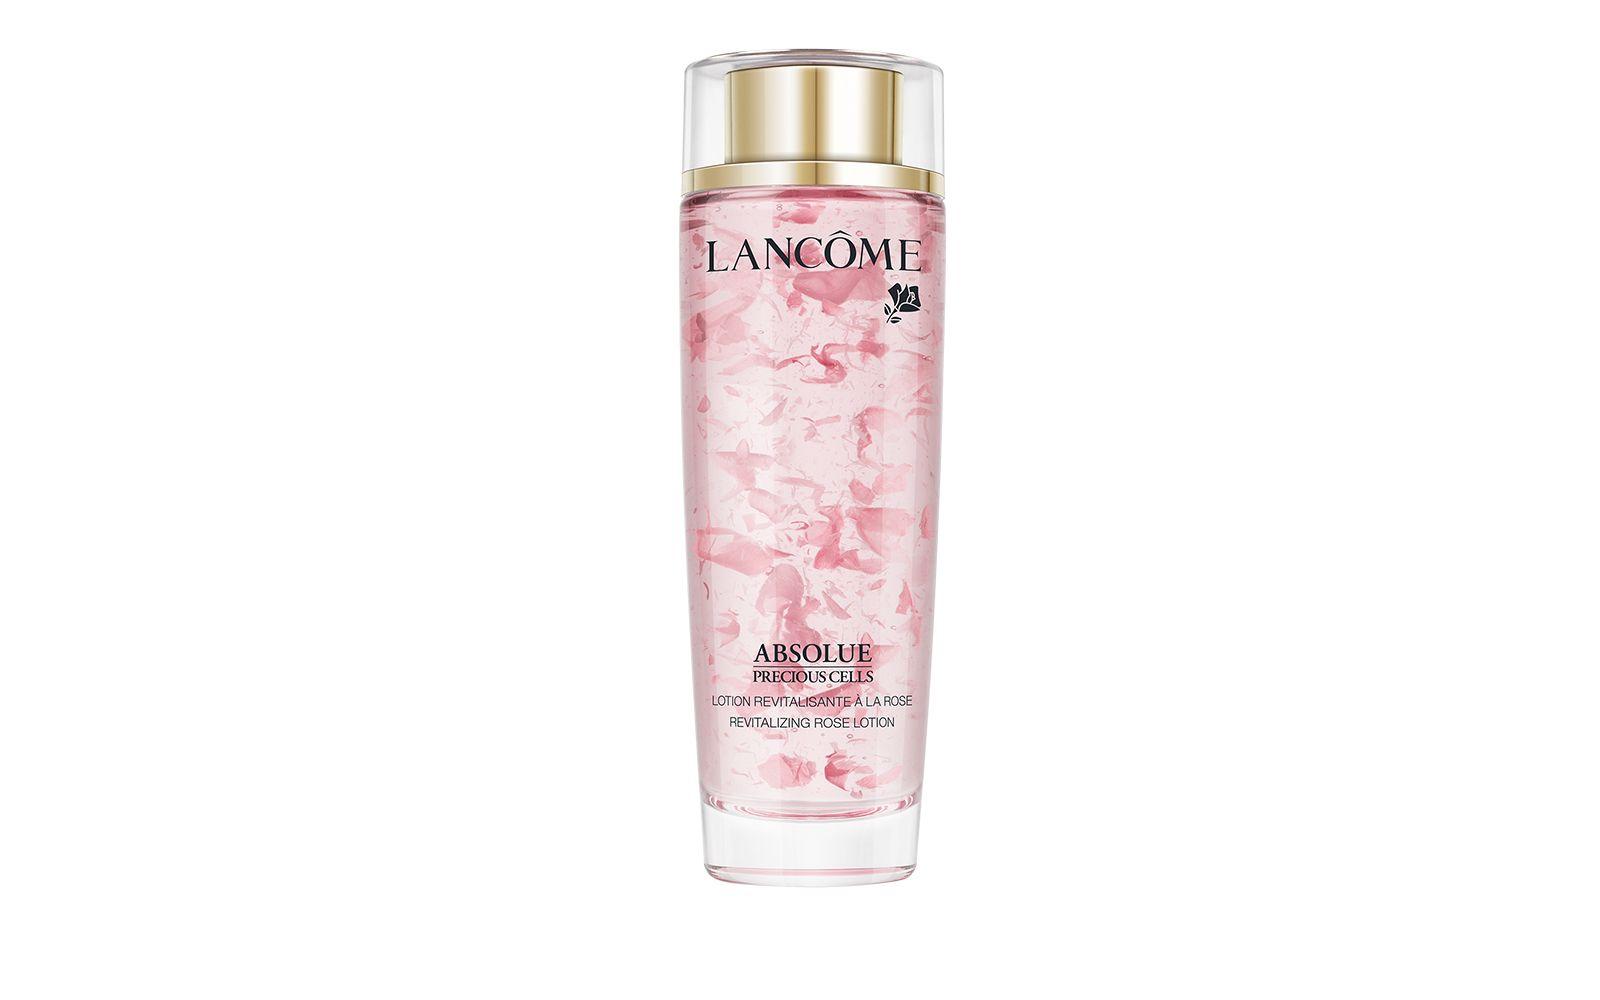 Lancôme Absolue Precious Cells Revitalising Rose Lotion (Photo: Courtesy of Lancôme)